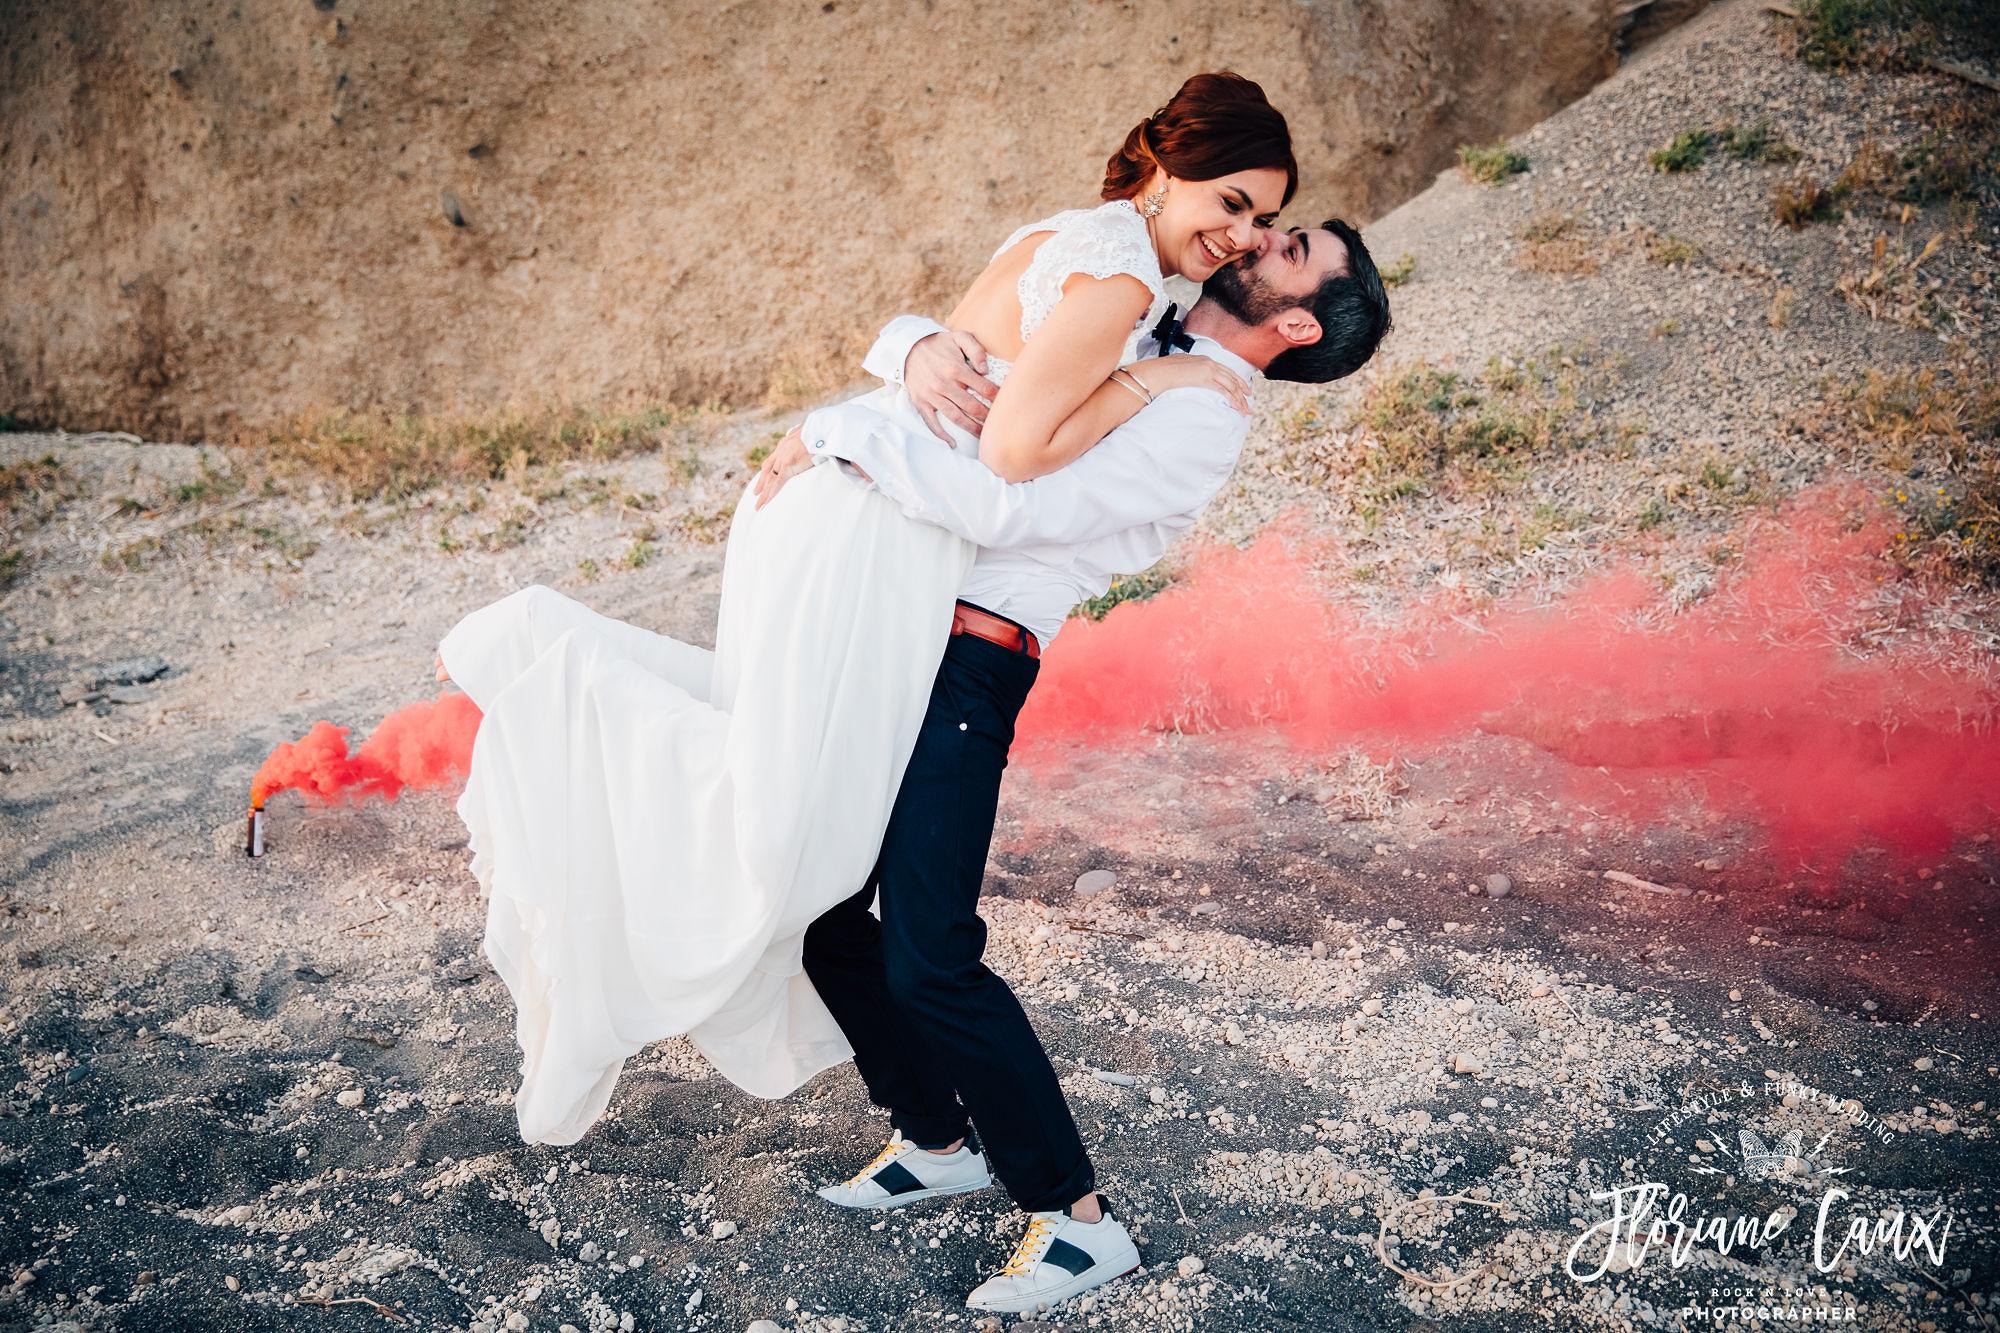 Wedding-planner-Toulouse+Floriane-CAUX-Mariage-Santorin(87)